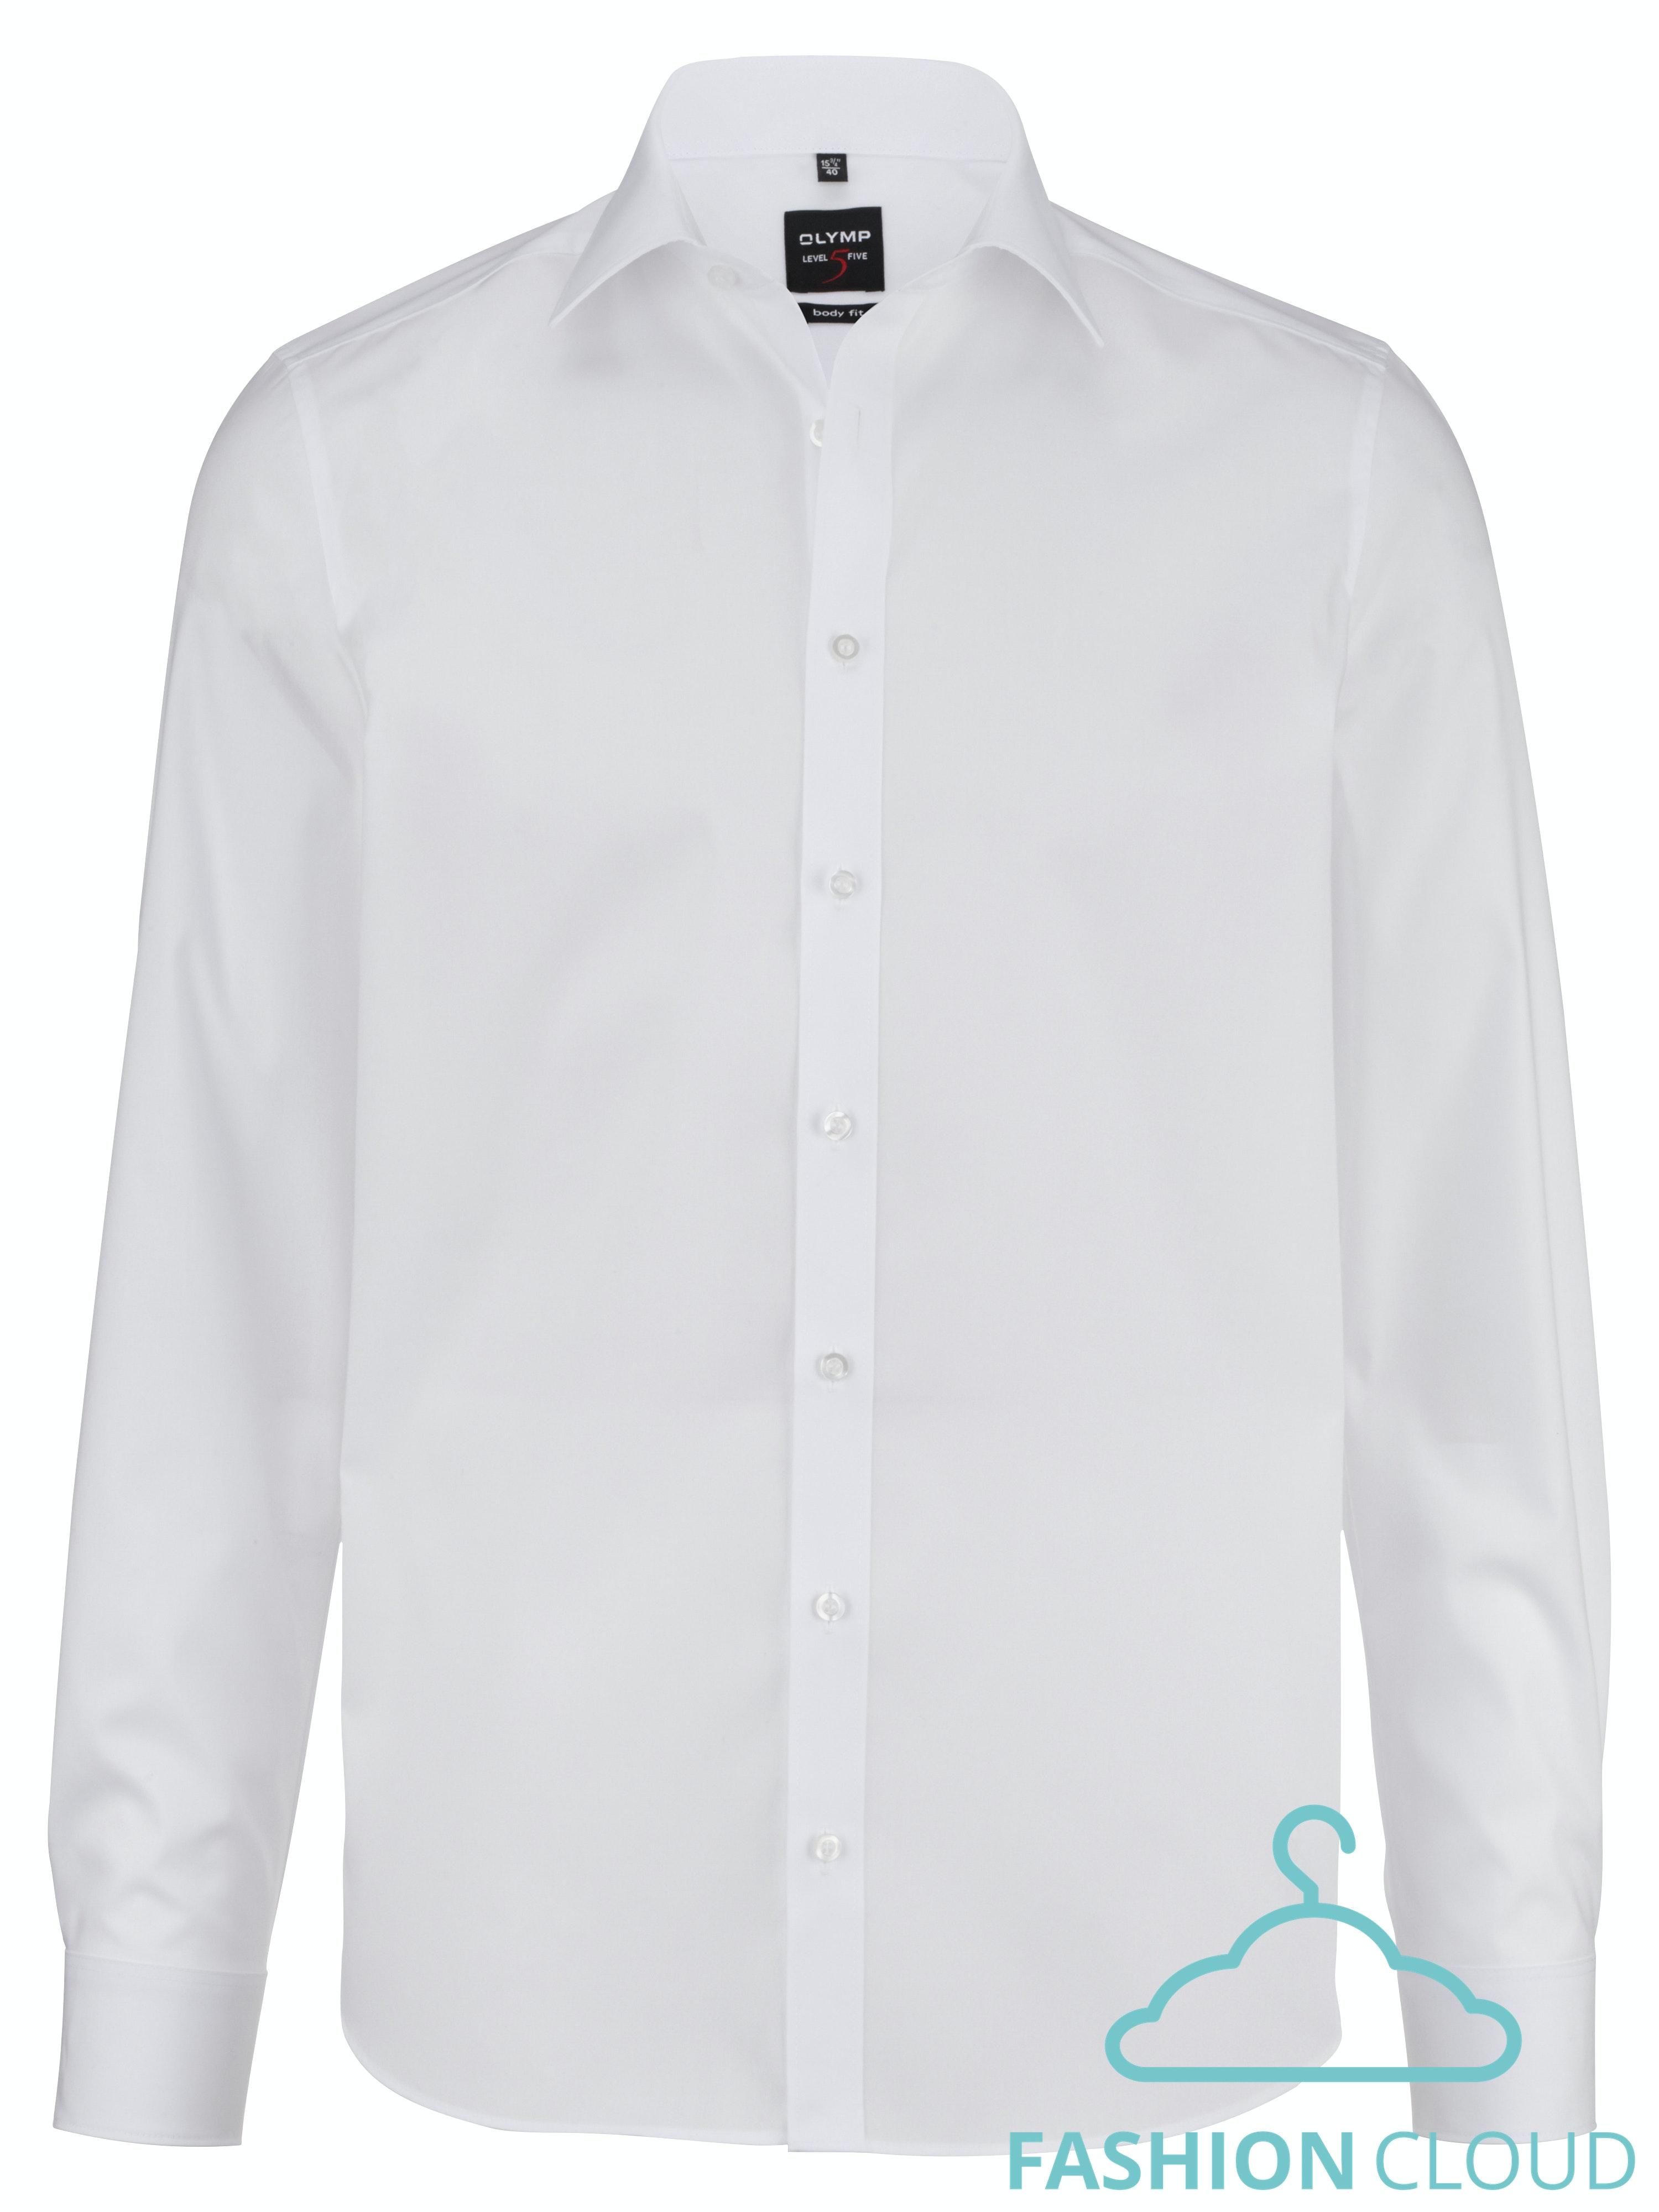 6090/64 Hemden